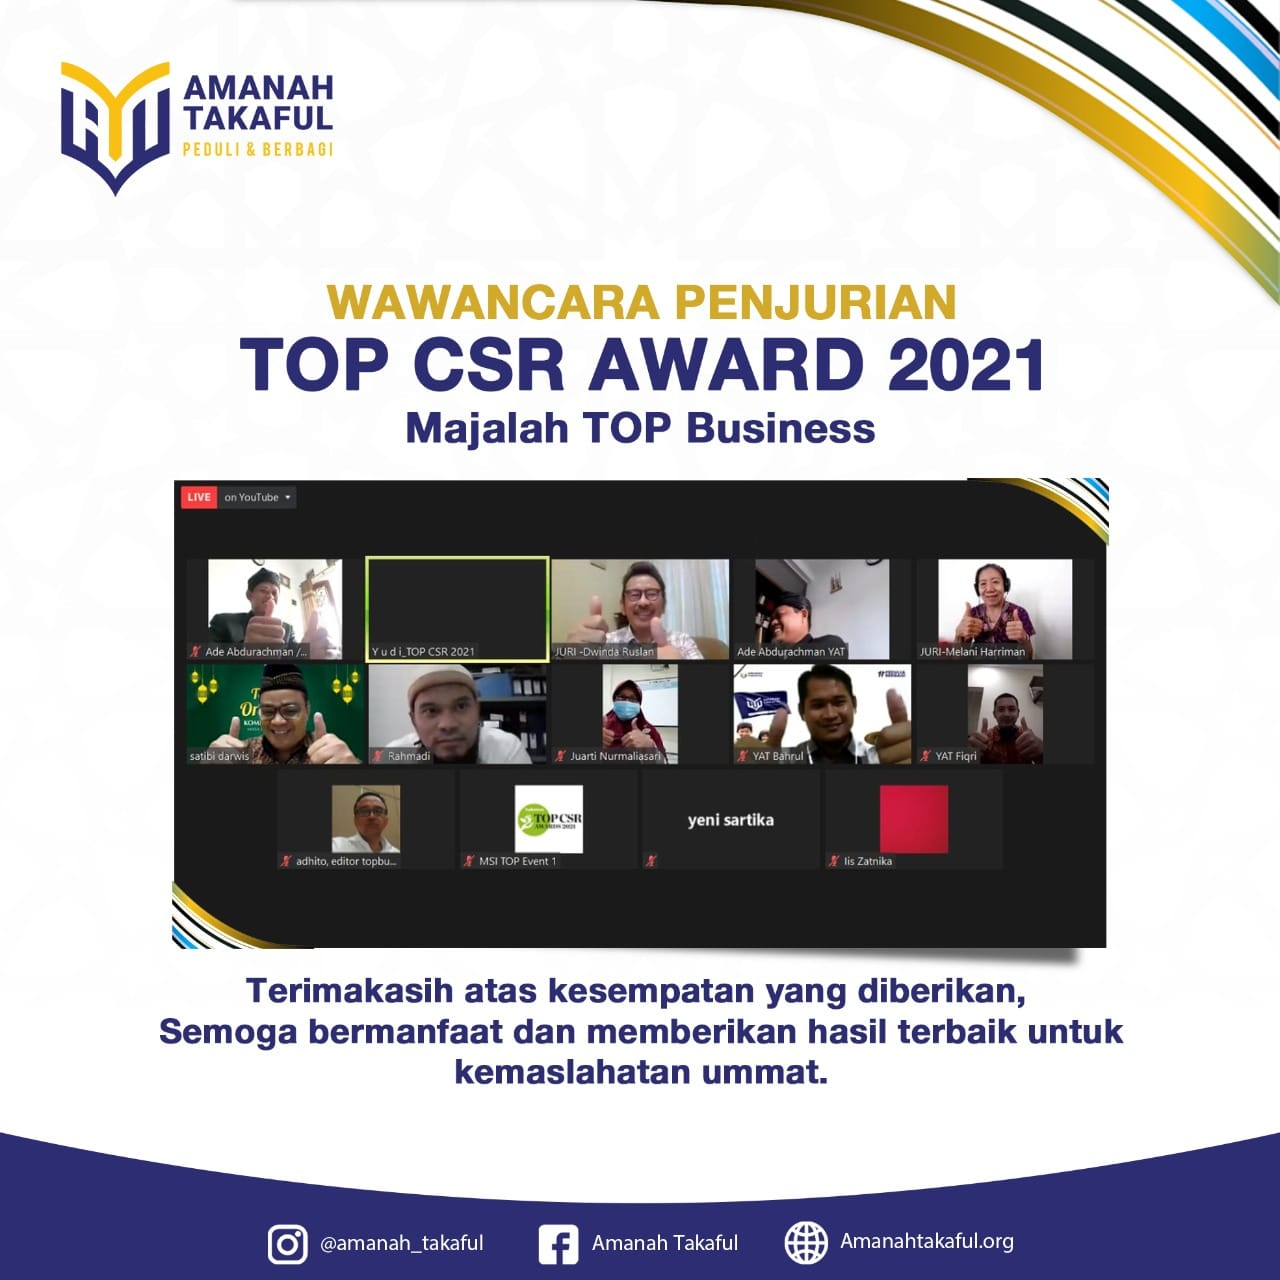 Penjurian TOP CSR Award 2021